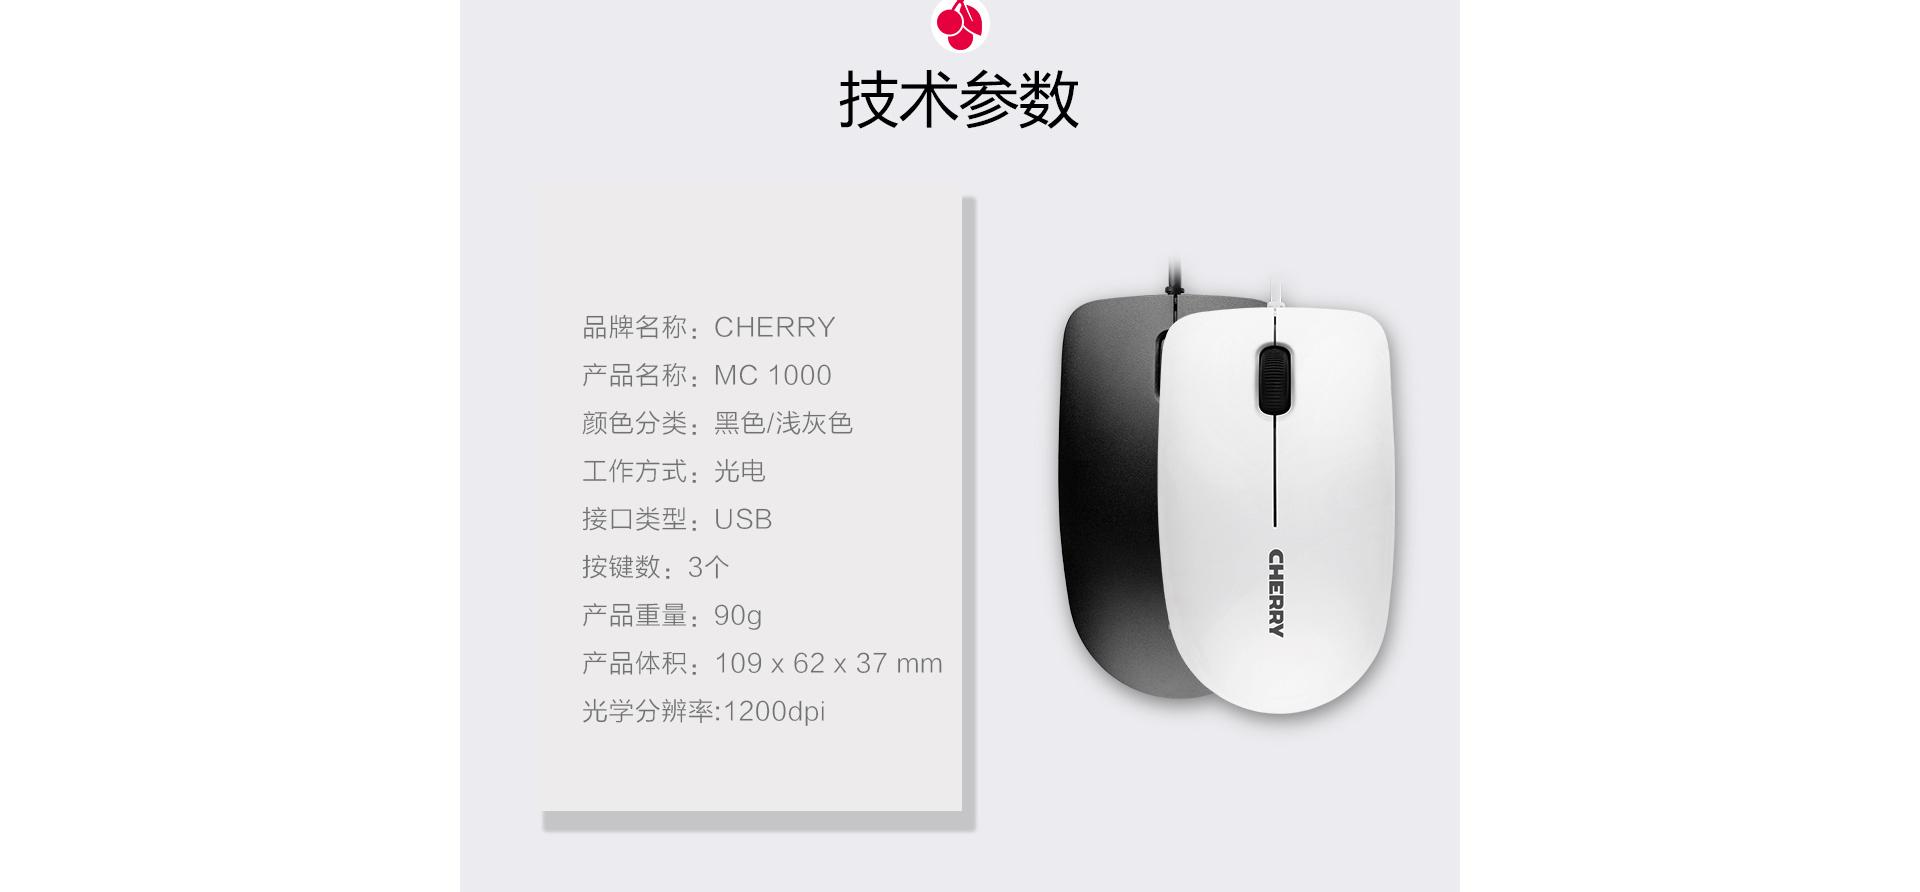 Cherry-MC1000_05.jpg